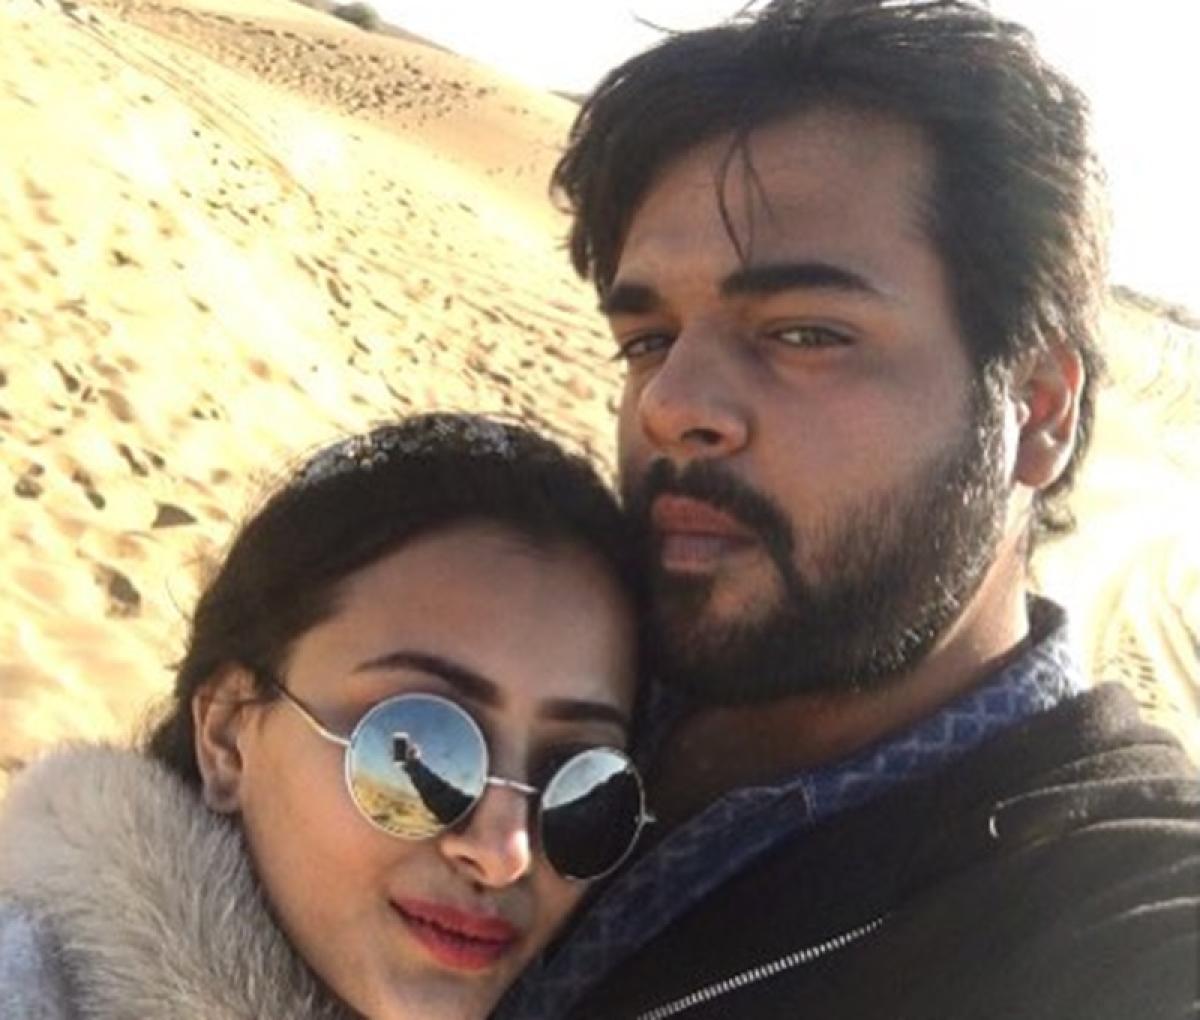 Television actress Shweta Basu Prasad engaged to long-time boyfriend filmmaker Rohit Mittal